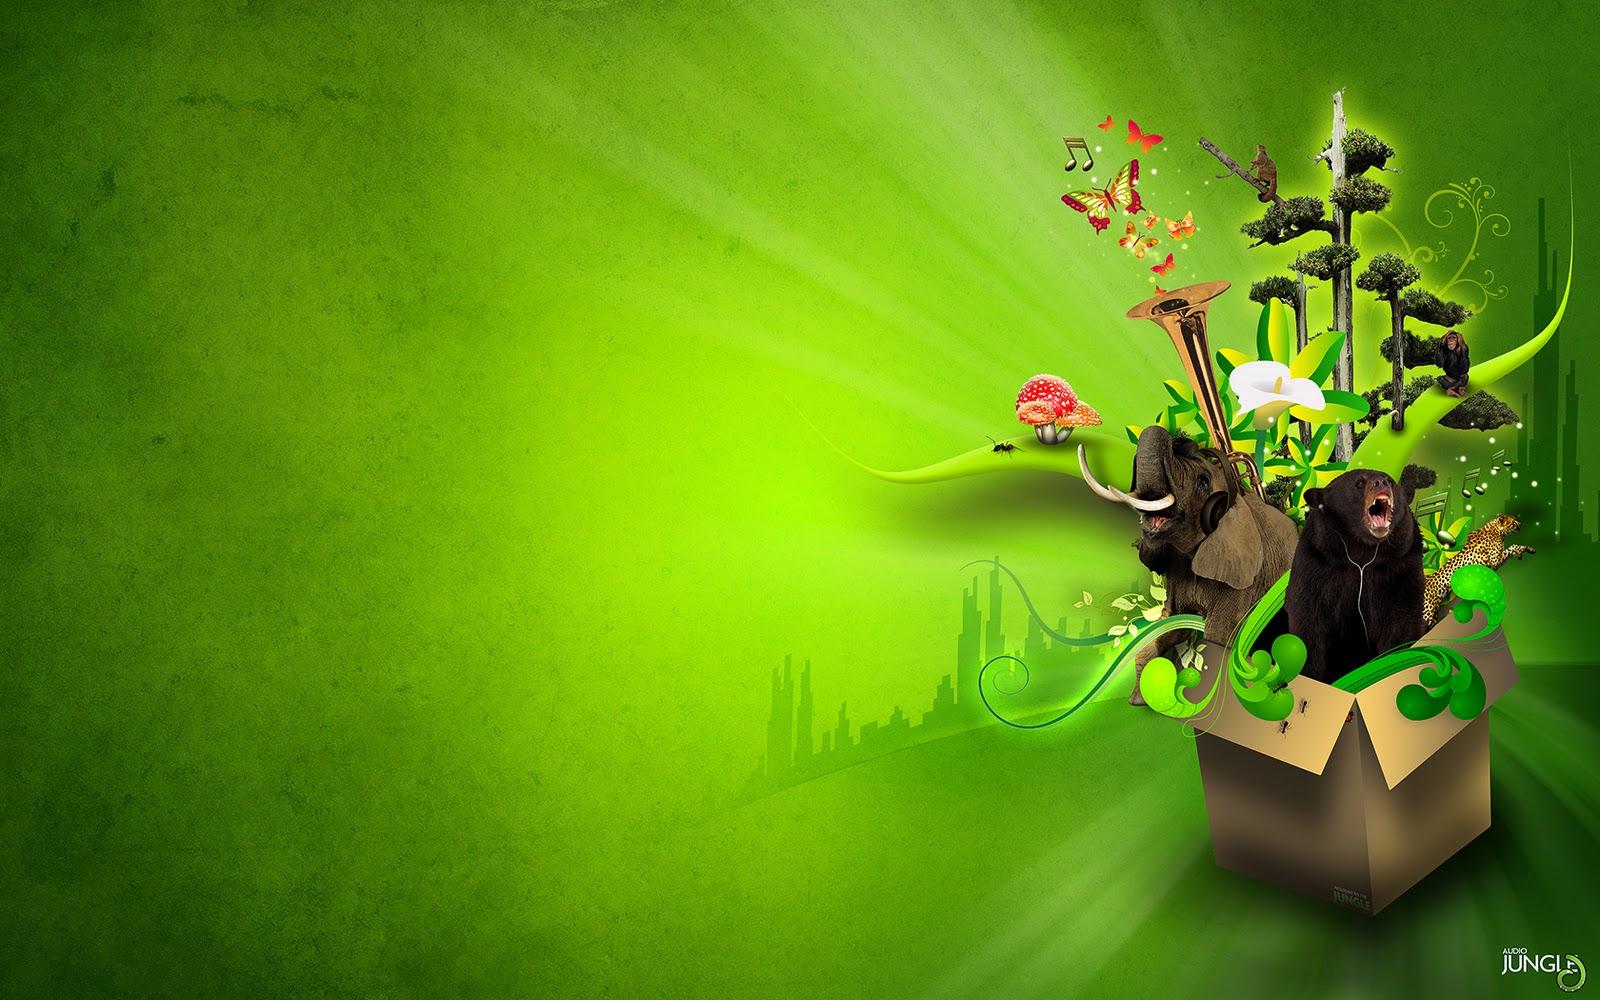 wallpapers of jungle,jungle wallpaper,jungle background,jungle theme,jungle